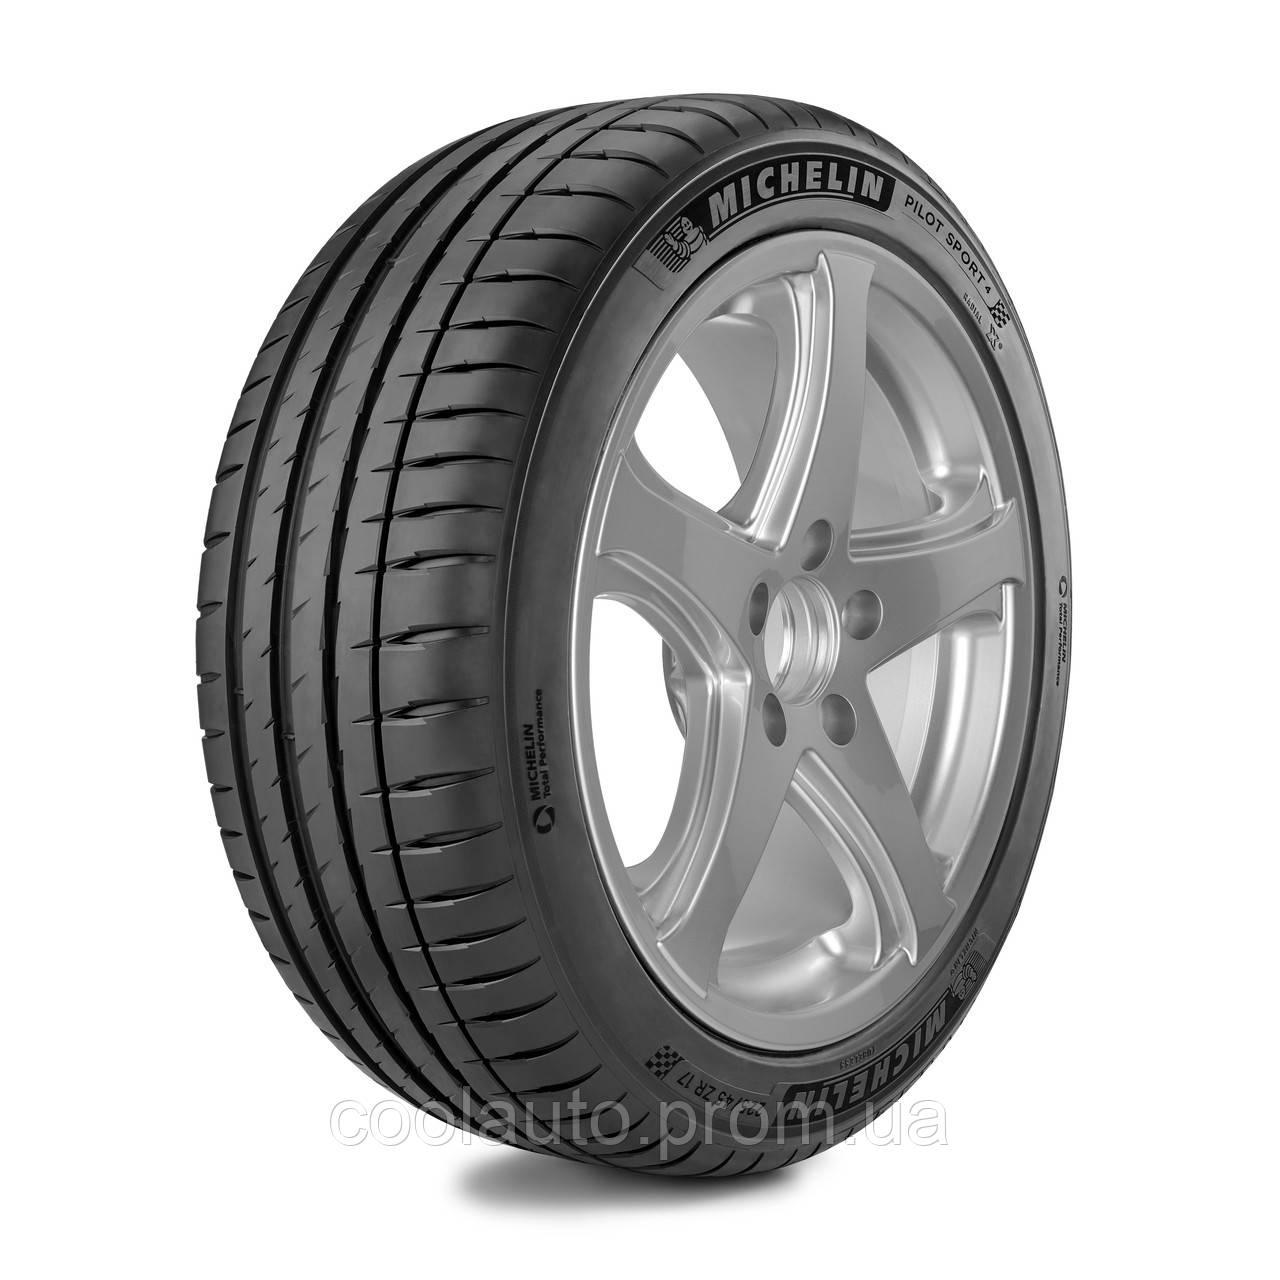 Шины Michelin Pilot Sport PS4 255/35 R18 94Y XL